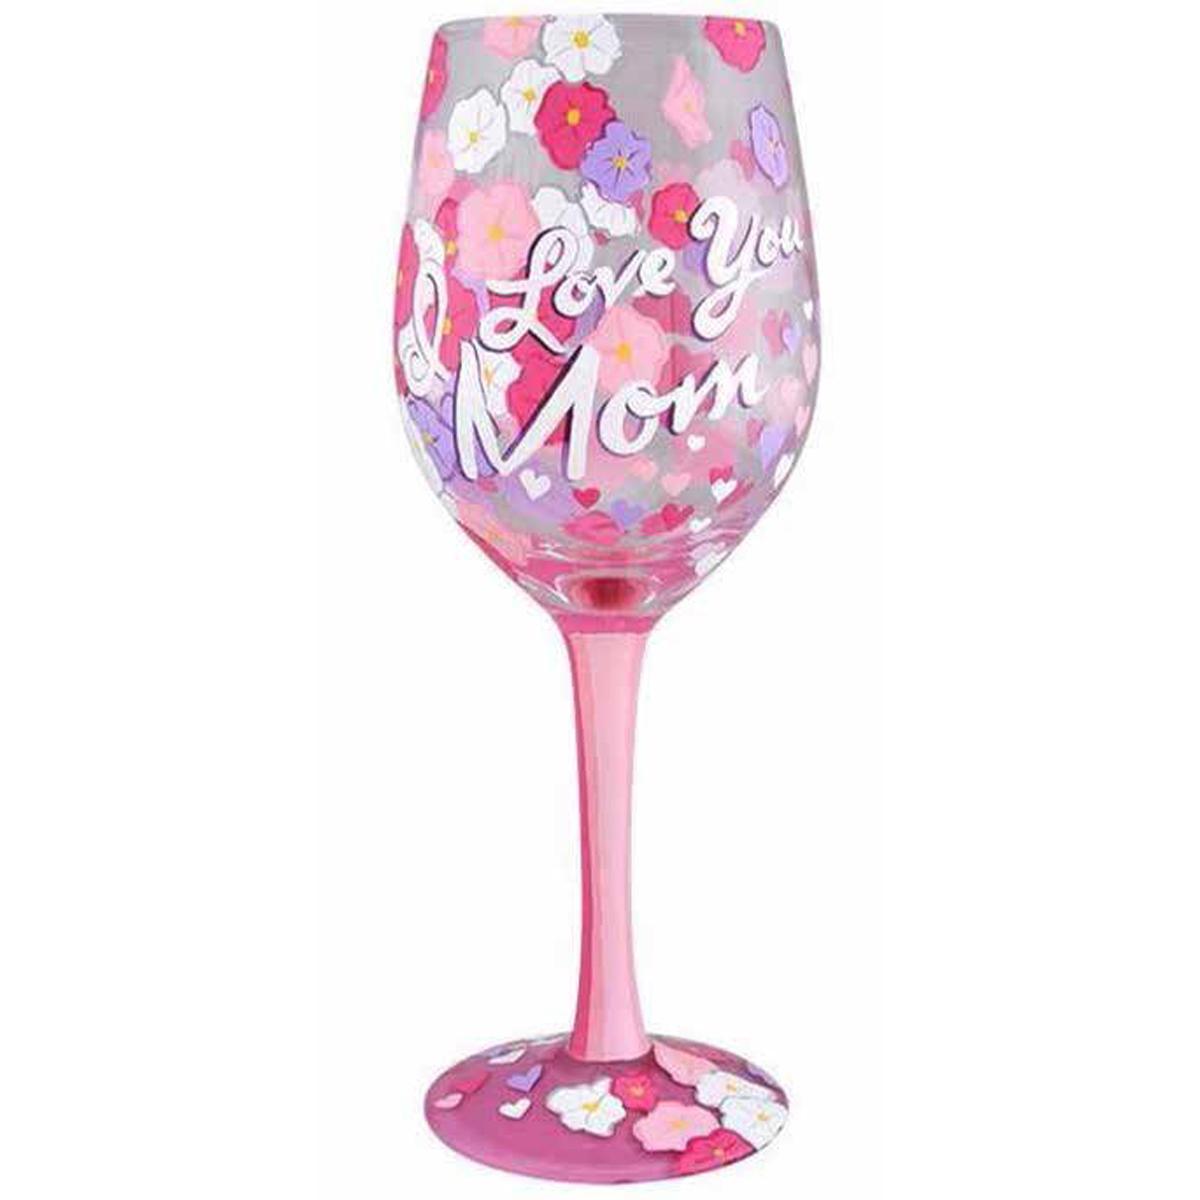 Verre à vin artisanal \'I love you Mum\' rose violet - 215 cm - [Q3391]